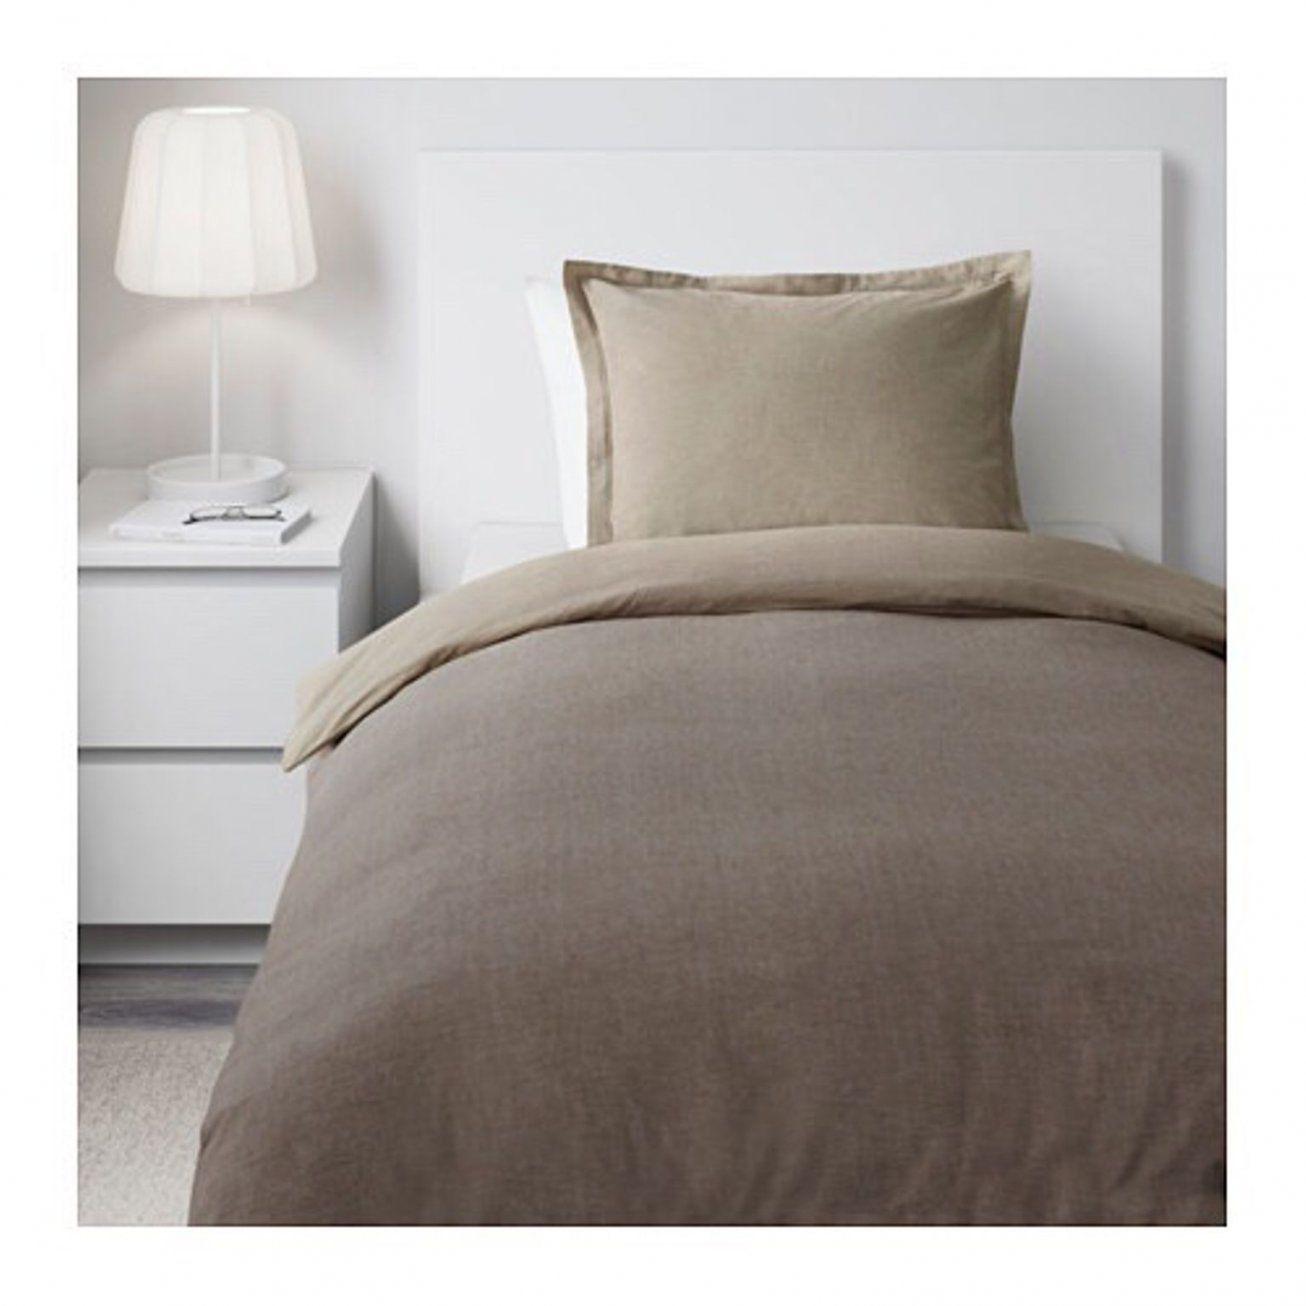 ikea bettwaesche sets dibinekadar decoration von ikea. Black Bedroom Furniture Sets. Home Design Ideas